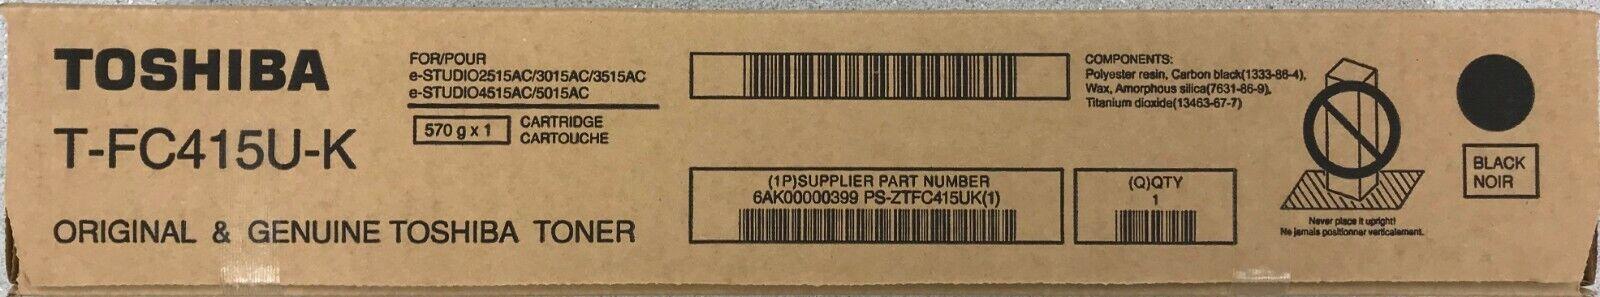 Black Toshiba TFC415UK T-FC415U-K E-Studio 2515AC 3015AC 3515AC 4515AC 5015AC Printers Toner Cartridge in Retail Packaging